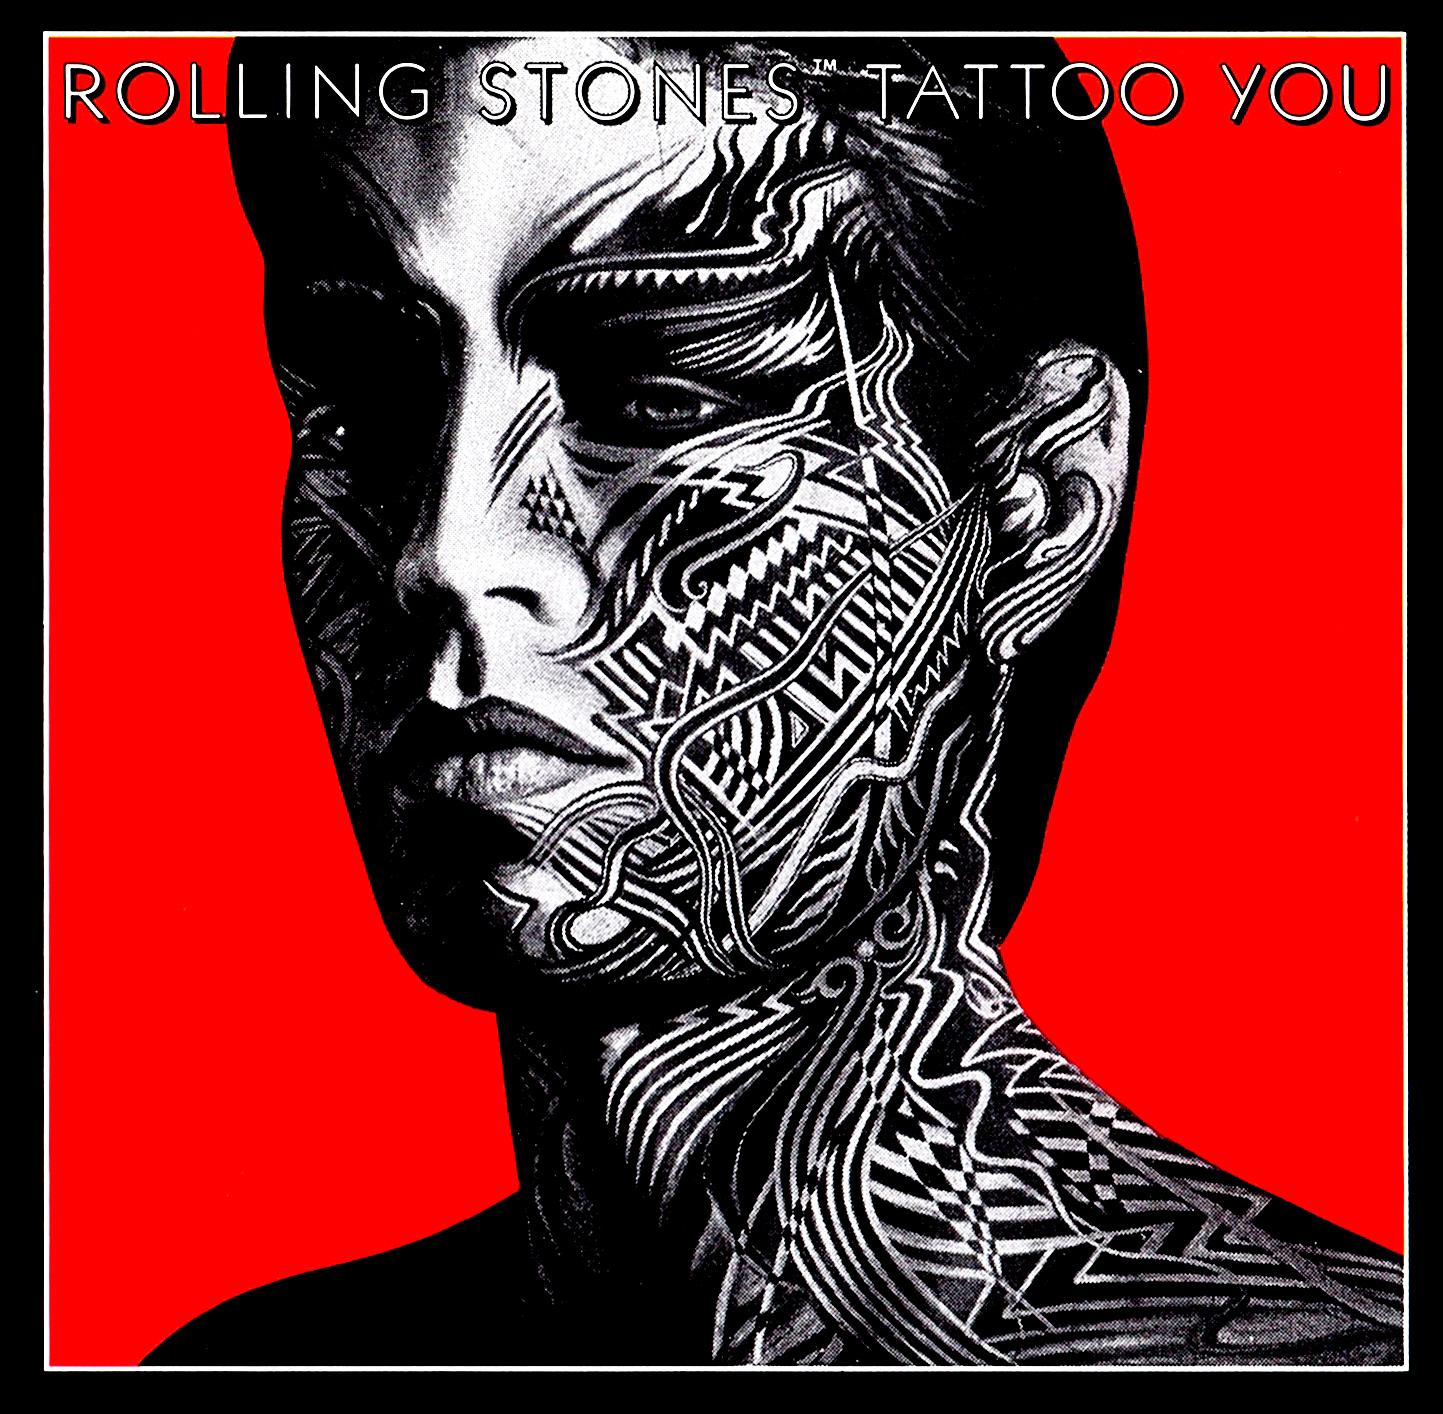 The Rolling Stones (ザ・ローリング・ストーンズ) アルバム『Tatoo You (刺青の男)』(1981年8月24日発売) 高画質CDジャケット画像 (ジャケ写)